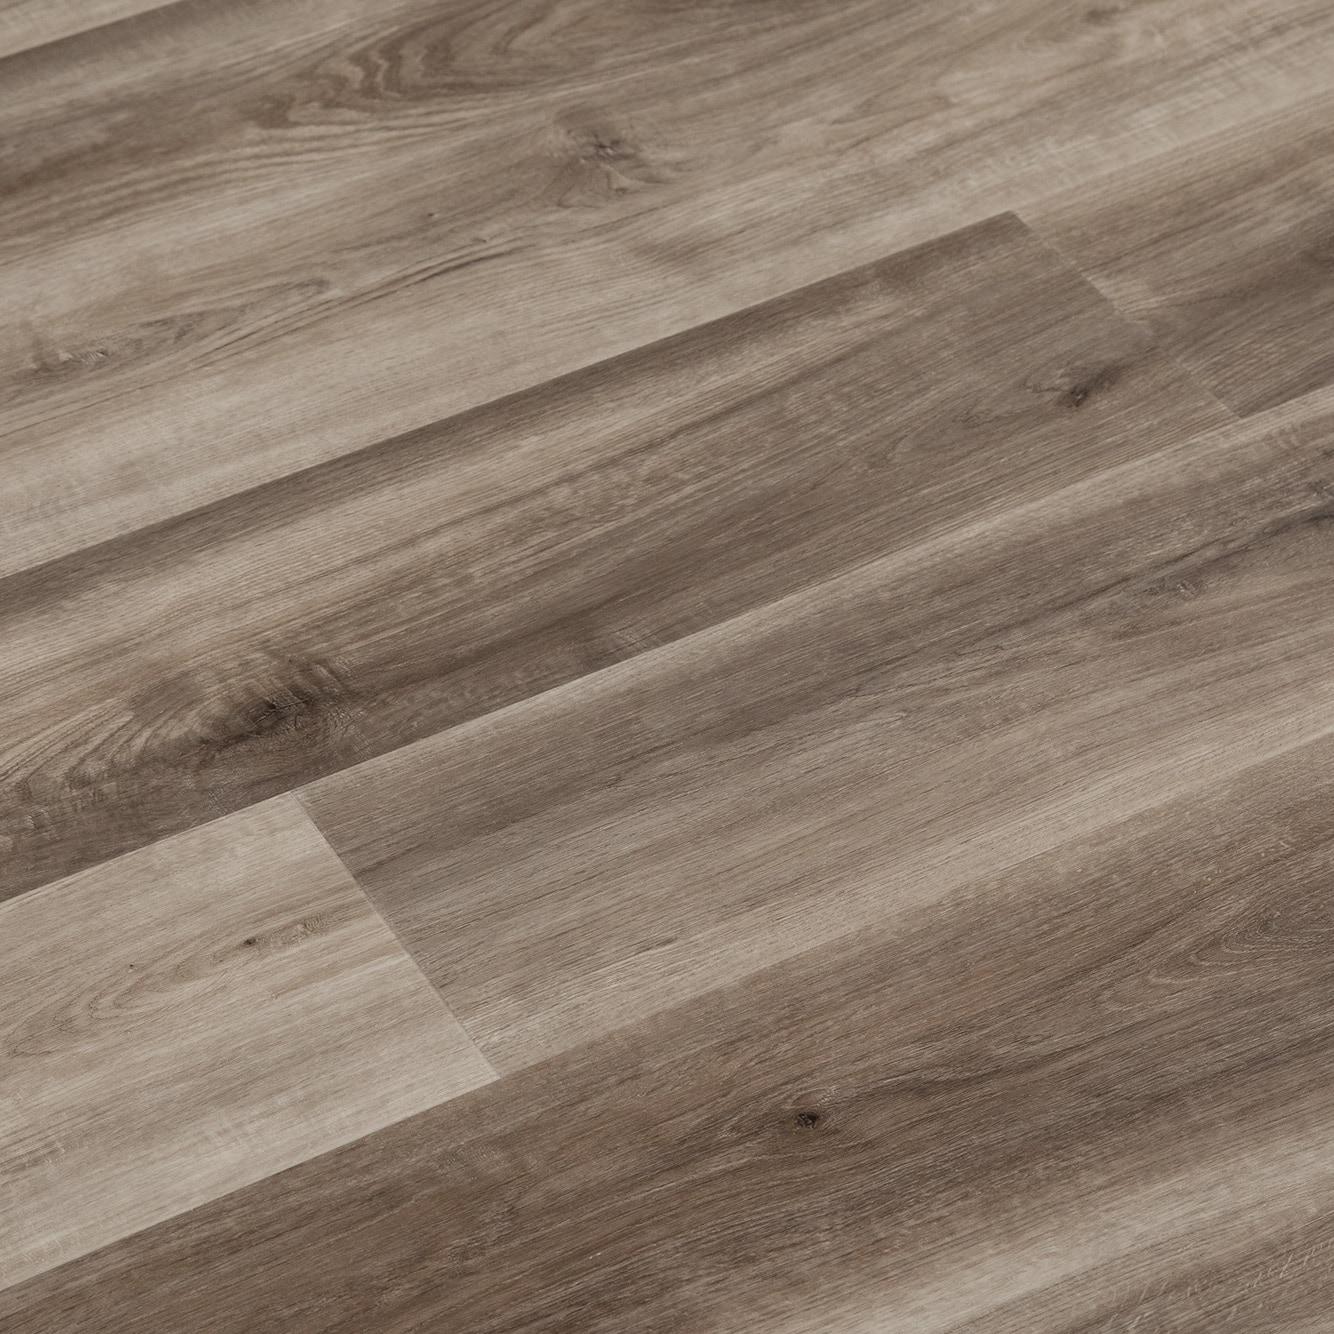 Brown Oak / 5mm / SPC / Click Lock Vinyl Planks - 5mm SPC Click Lock - Proteco Collection 0